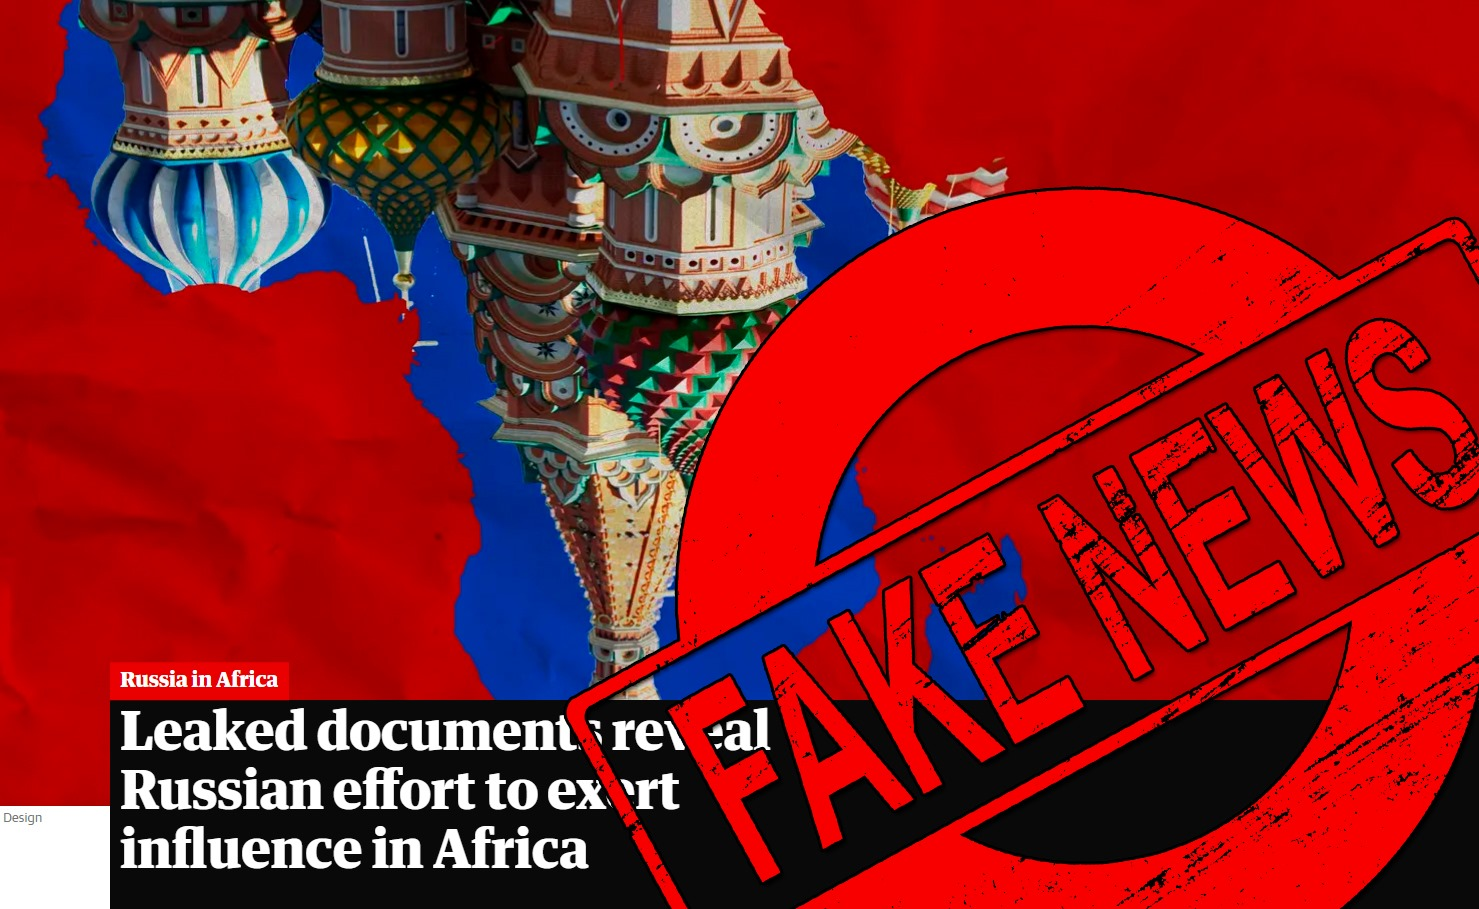 PANAF.NEWS - Guardian fake news (2019 06 14) ENGL